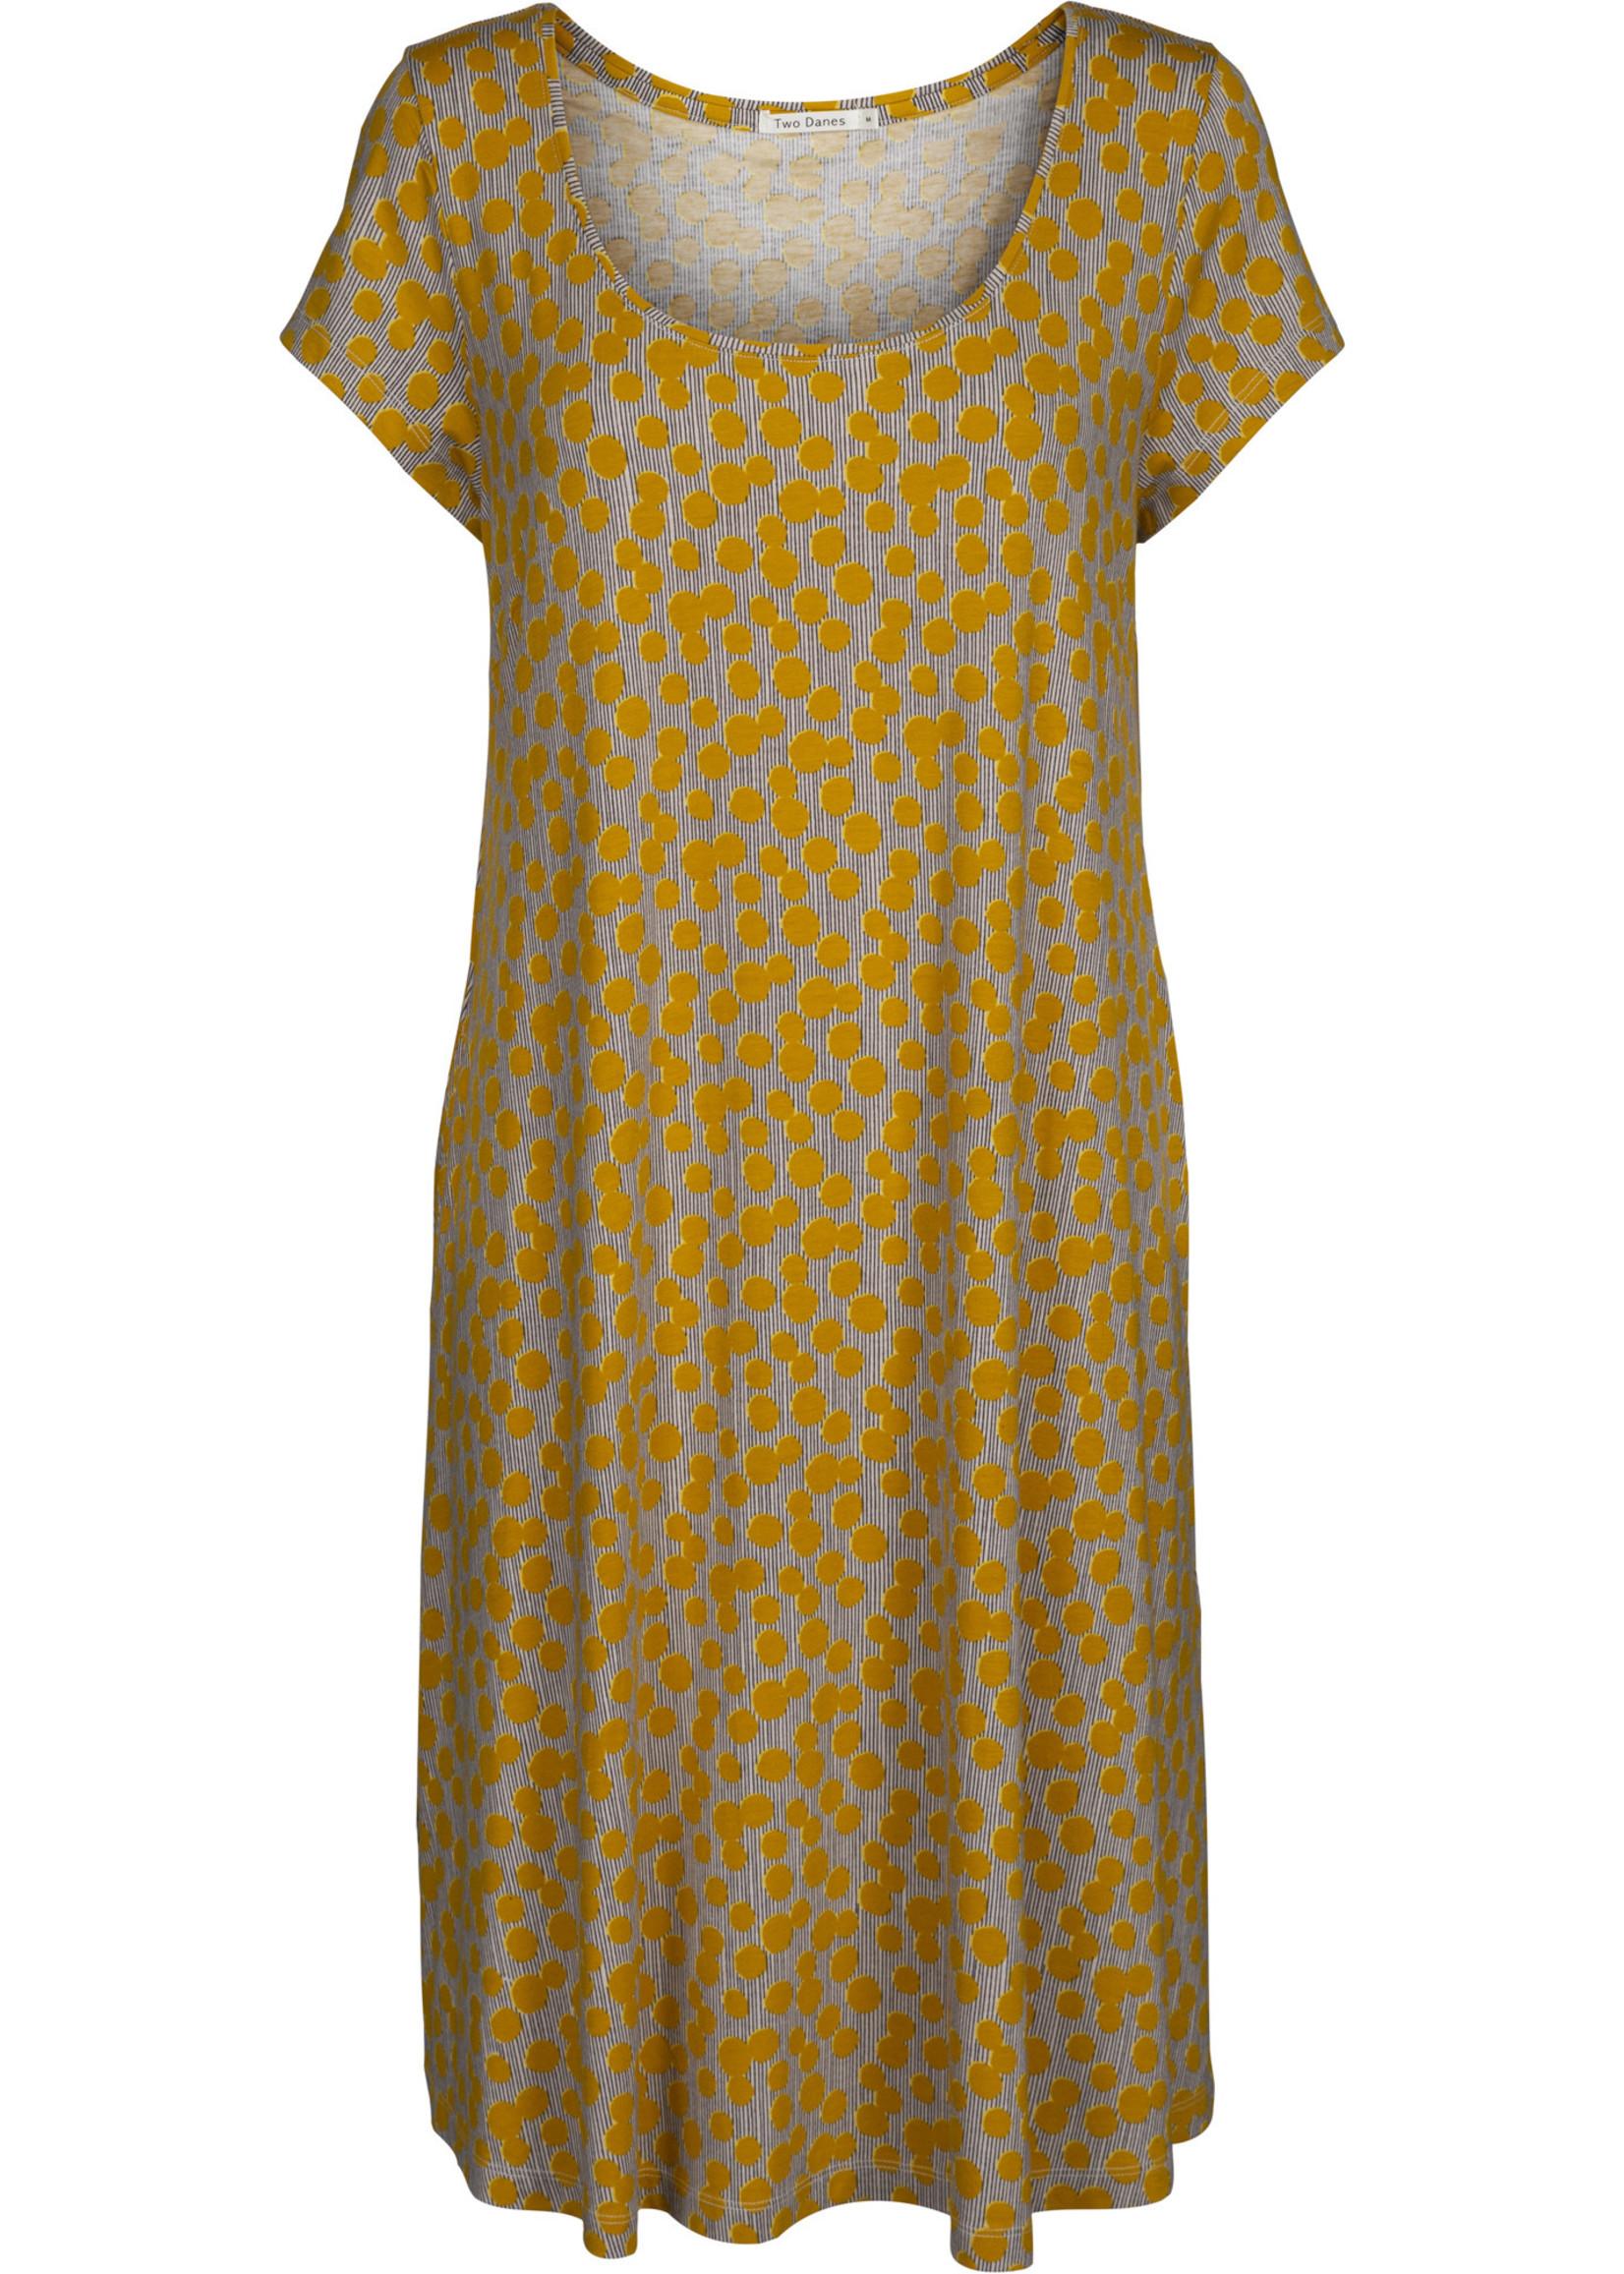 TWO DANES 33772 325 BLOOM PRINT BAMBOO DRESS